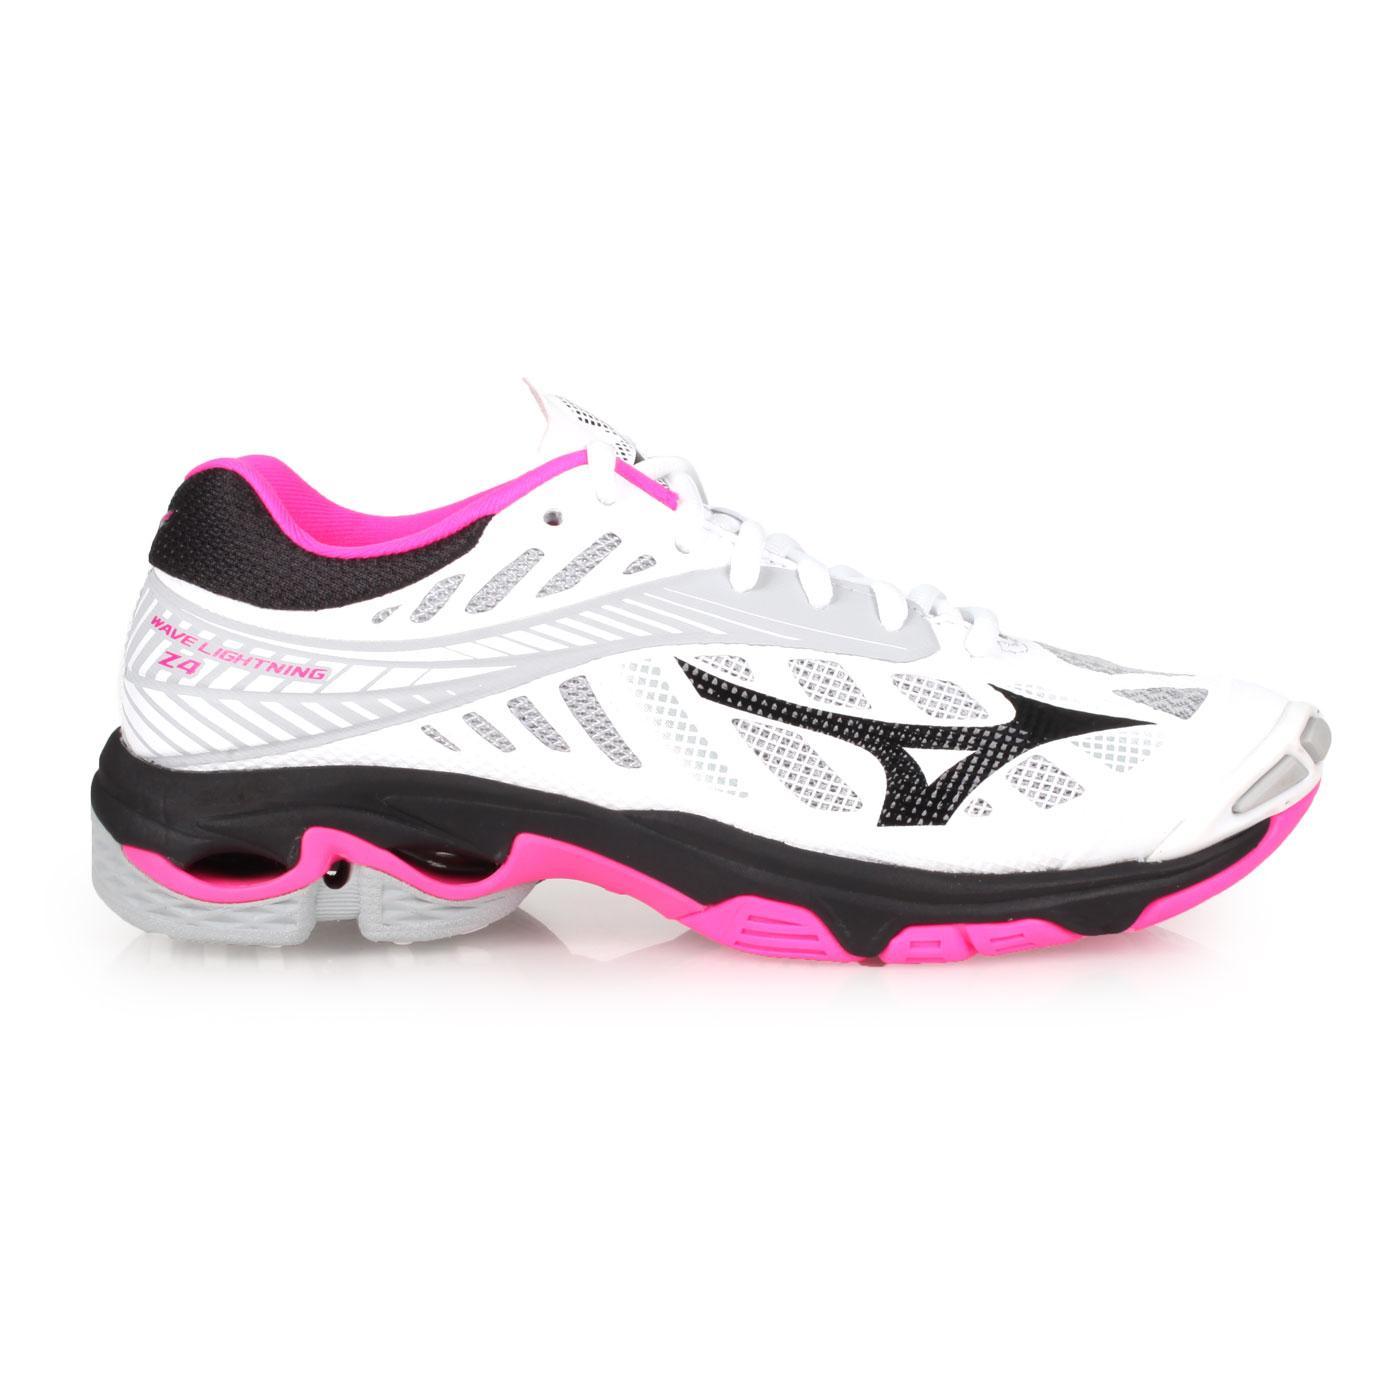 MIZUNO 女排球鞋  @WAVE LIGHTNING Z4@V1GC180064 - 白粉灰黑